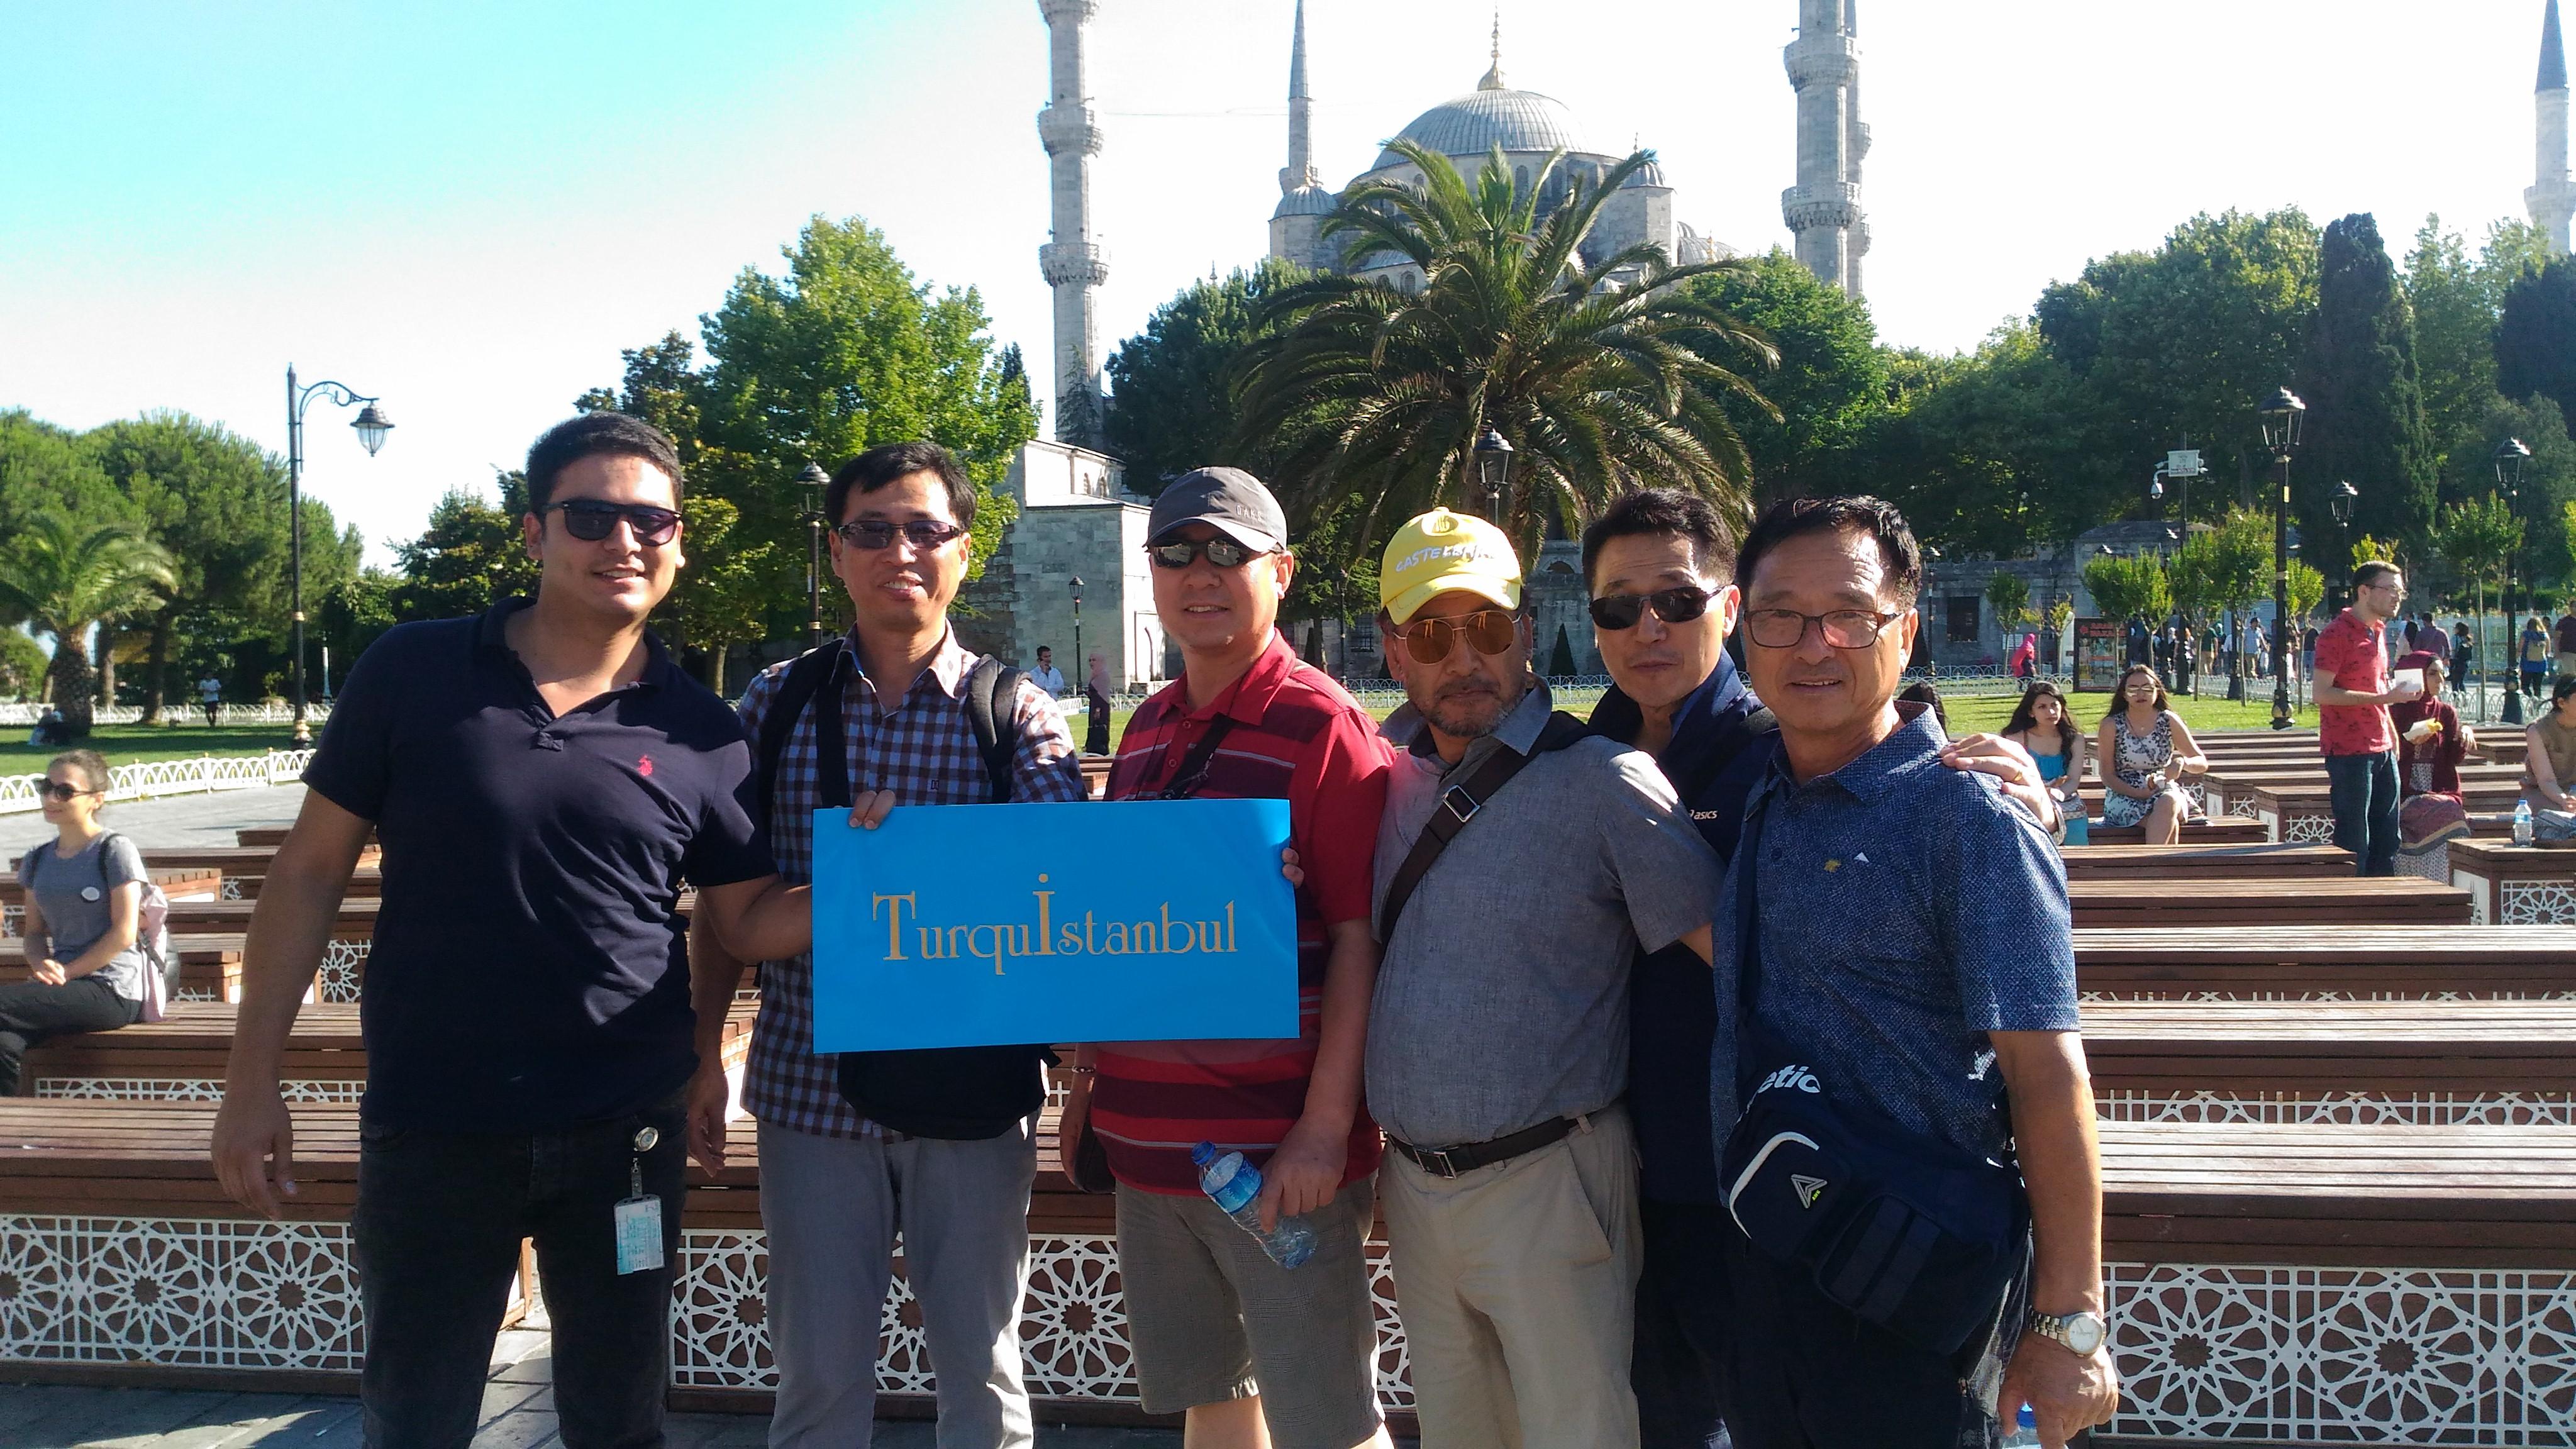 turquistanbul